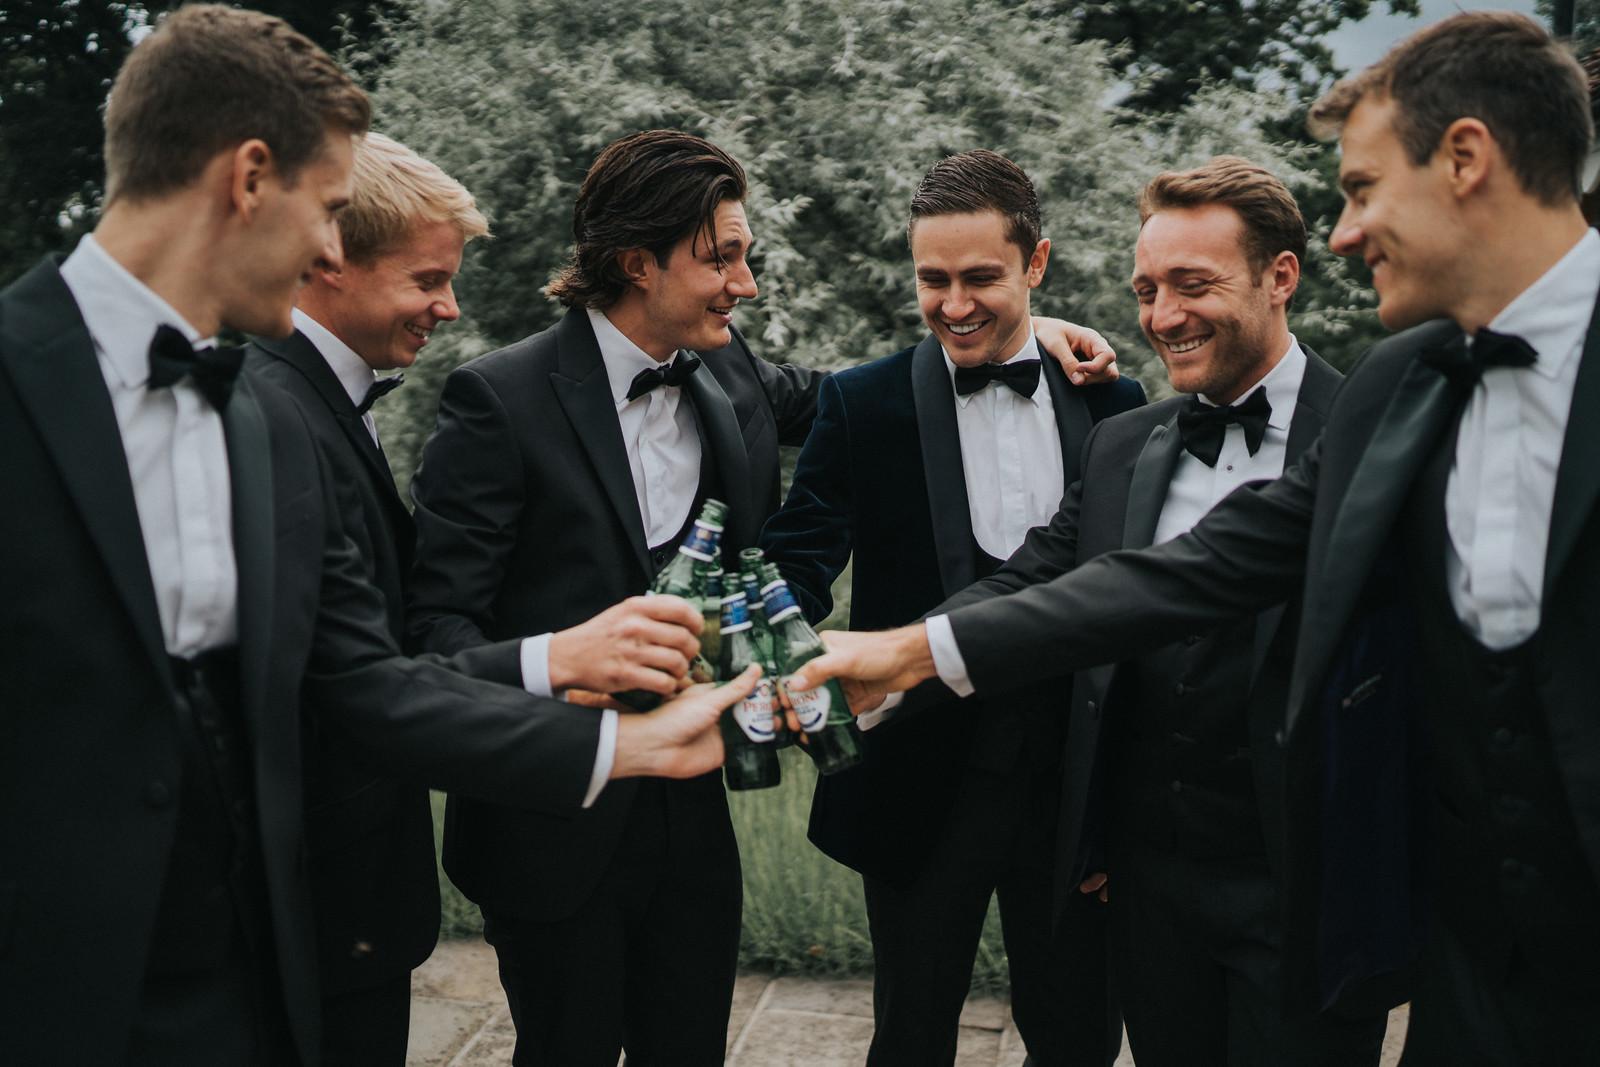 the groomsmen cheers to getting married